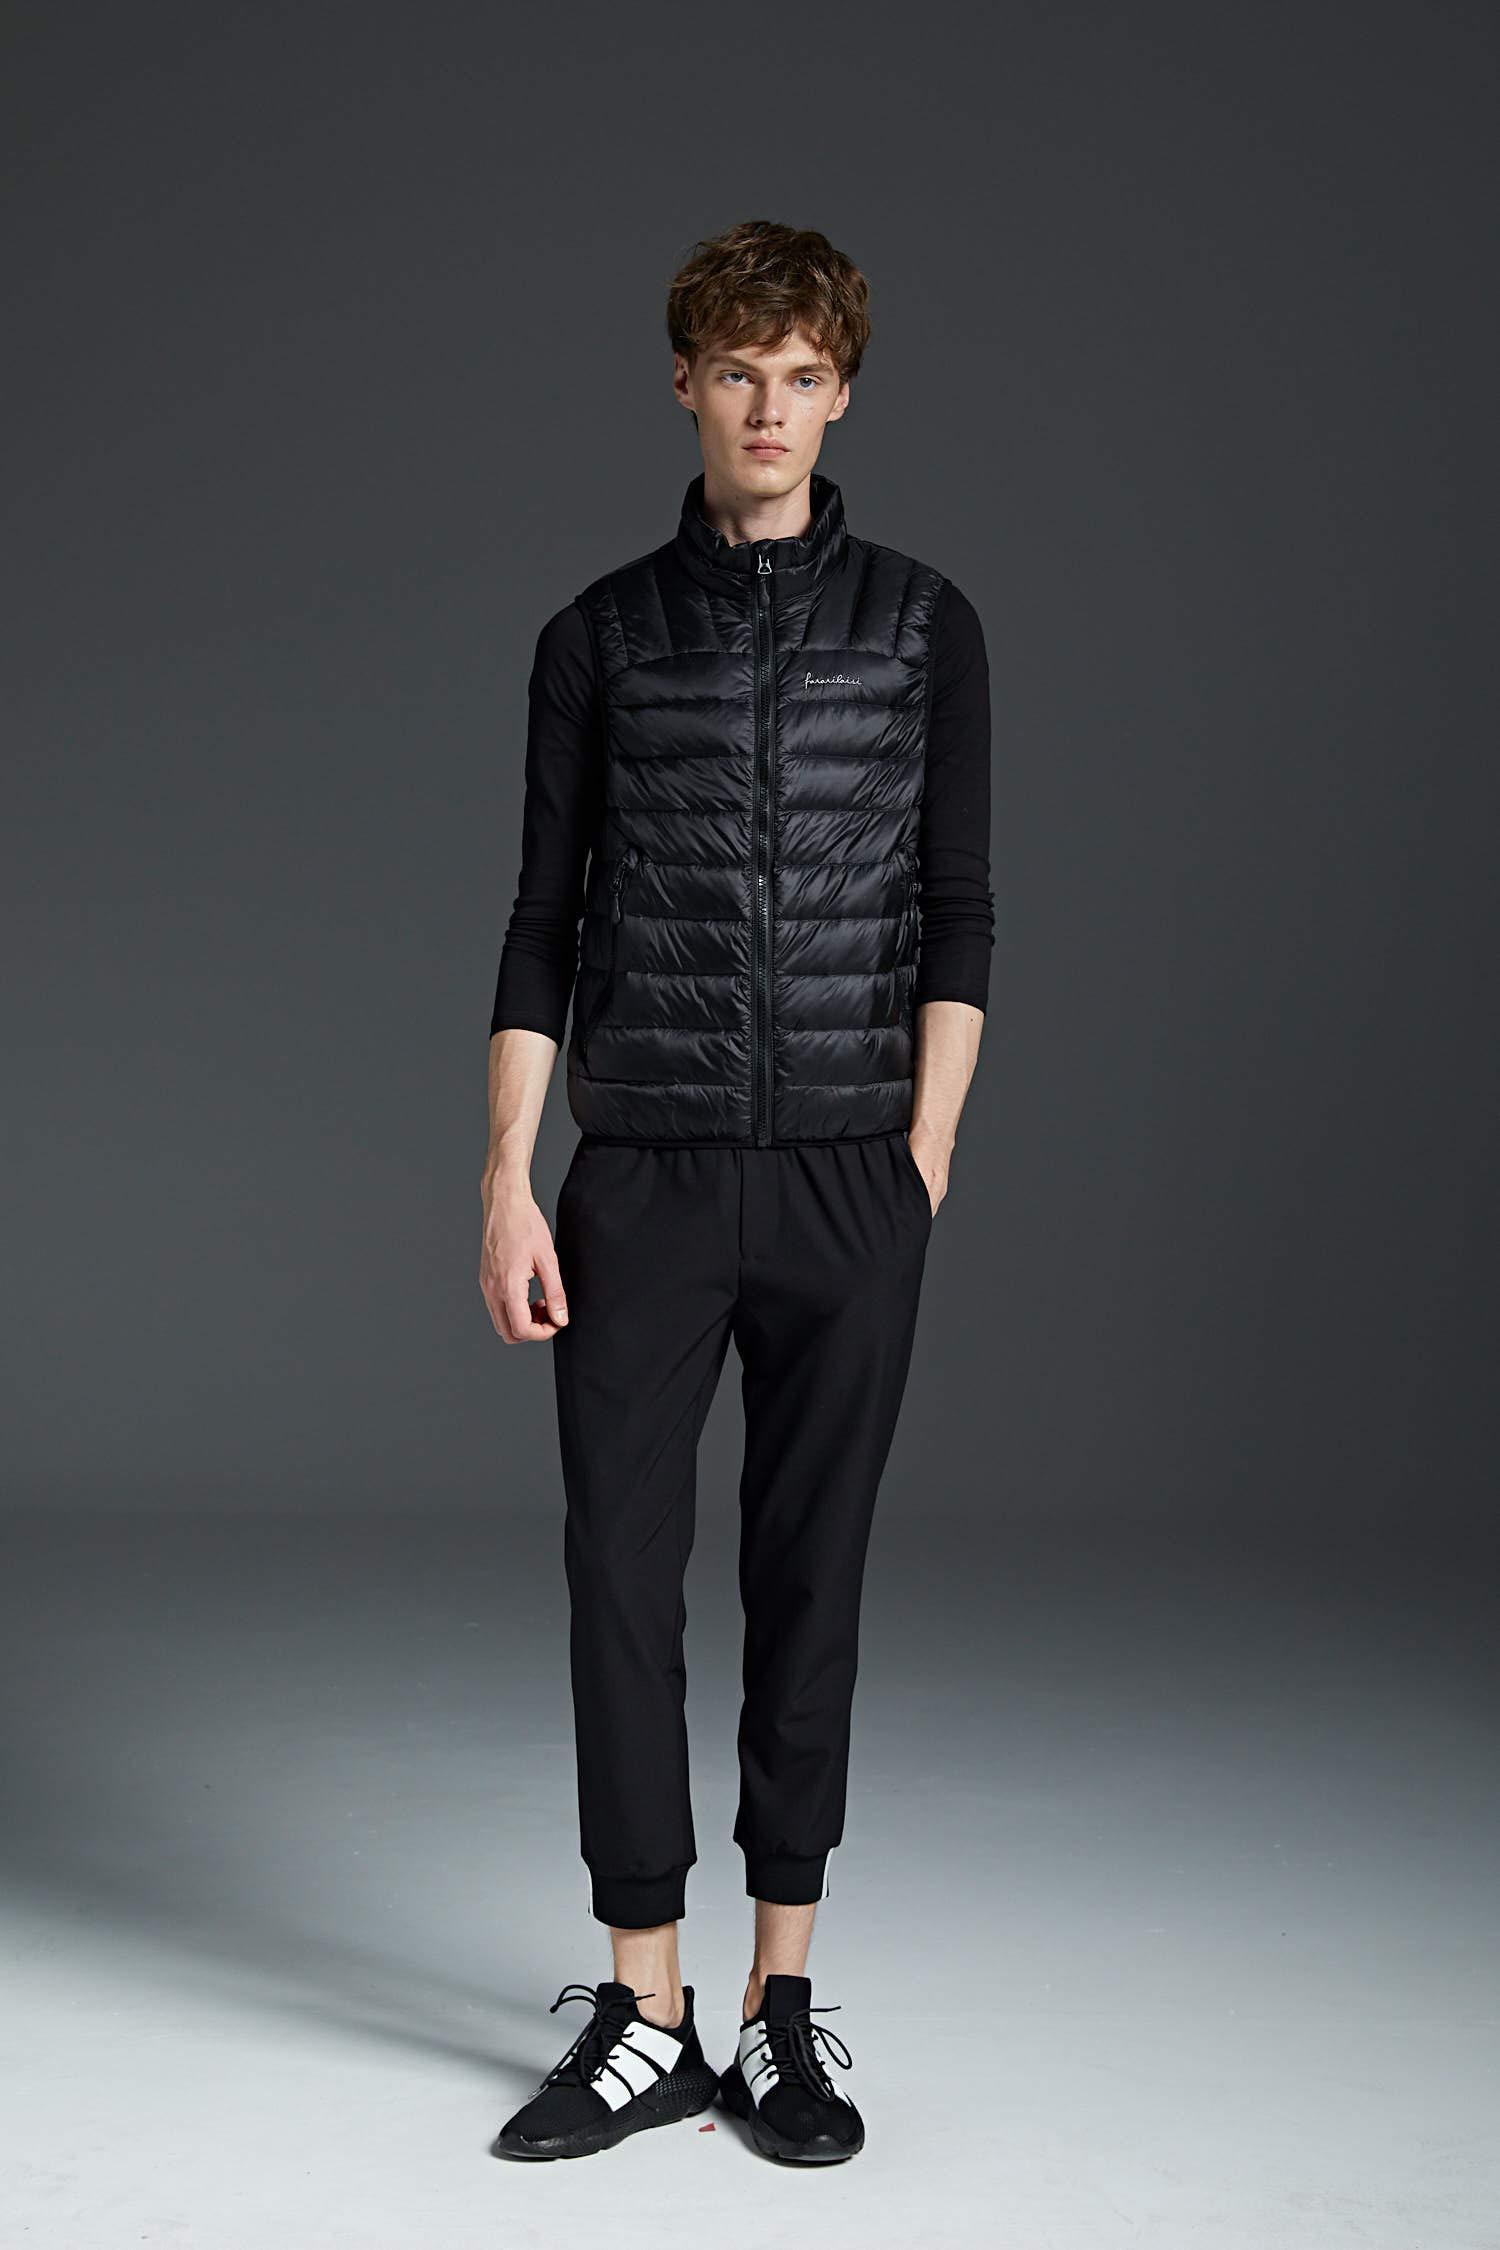 61XfrG wGGL - NBWS Men's Down Vest Quilted Gilet Mandarin Collar Vest Bodywarmer Sleeveless Slim-fit Outdoor Vests